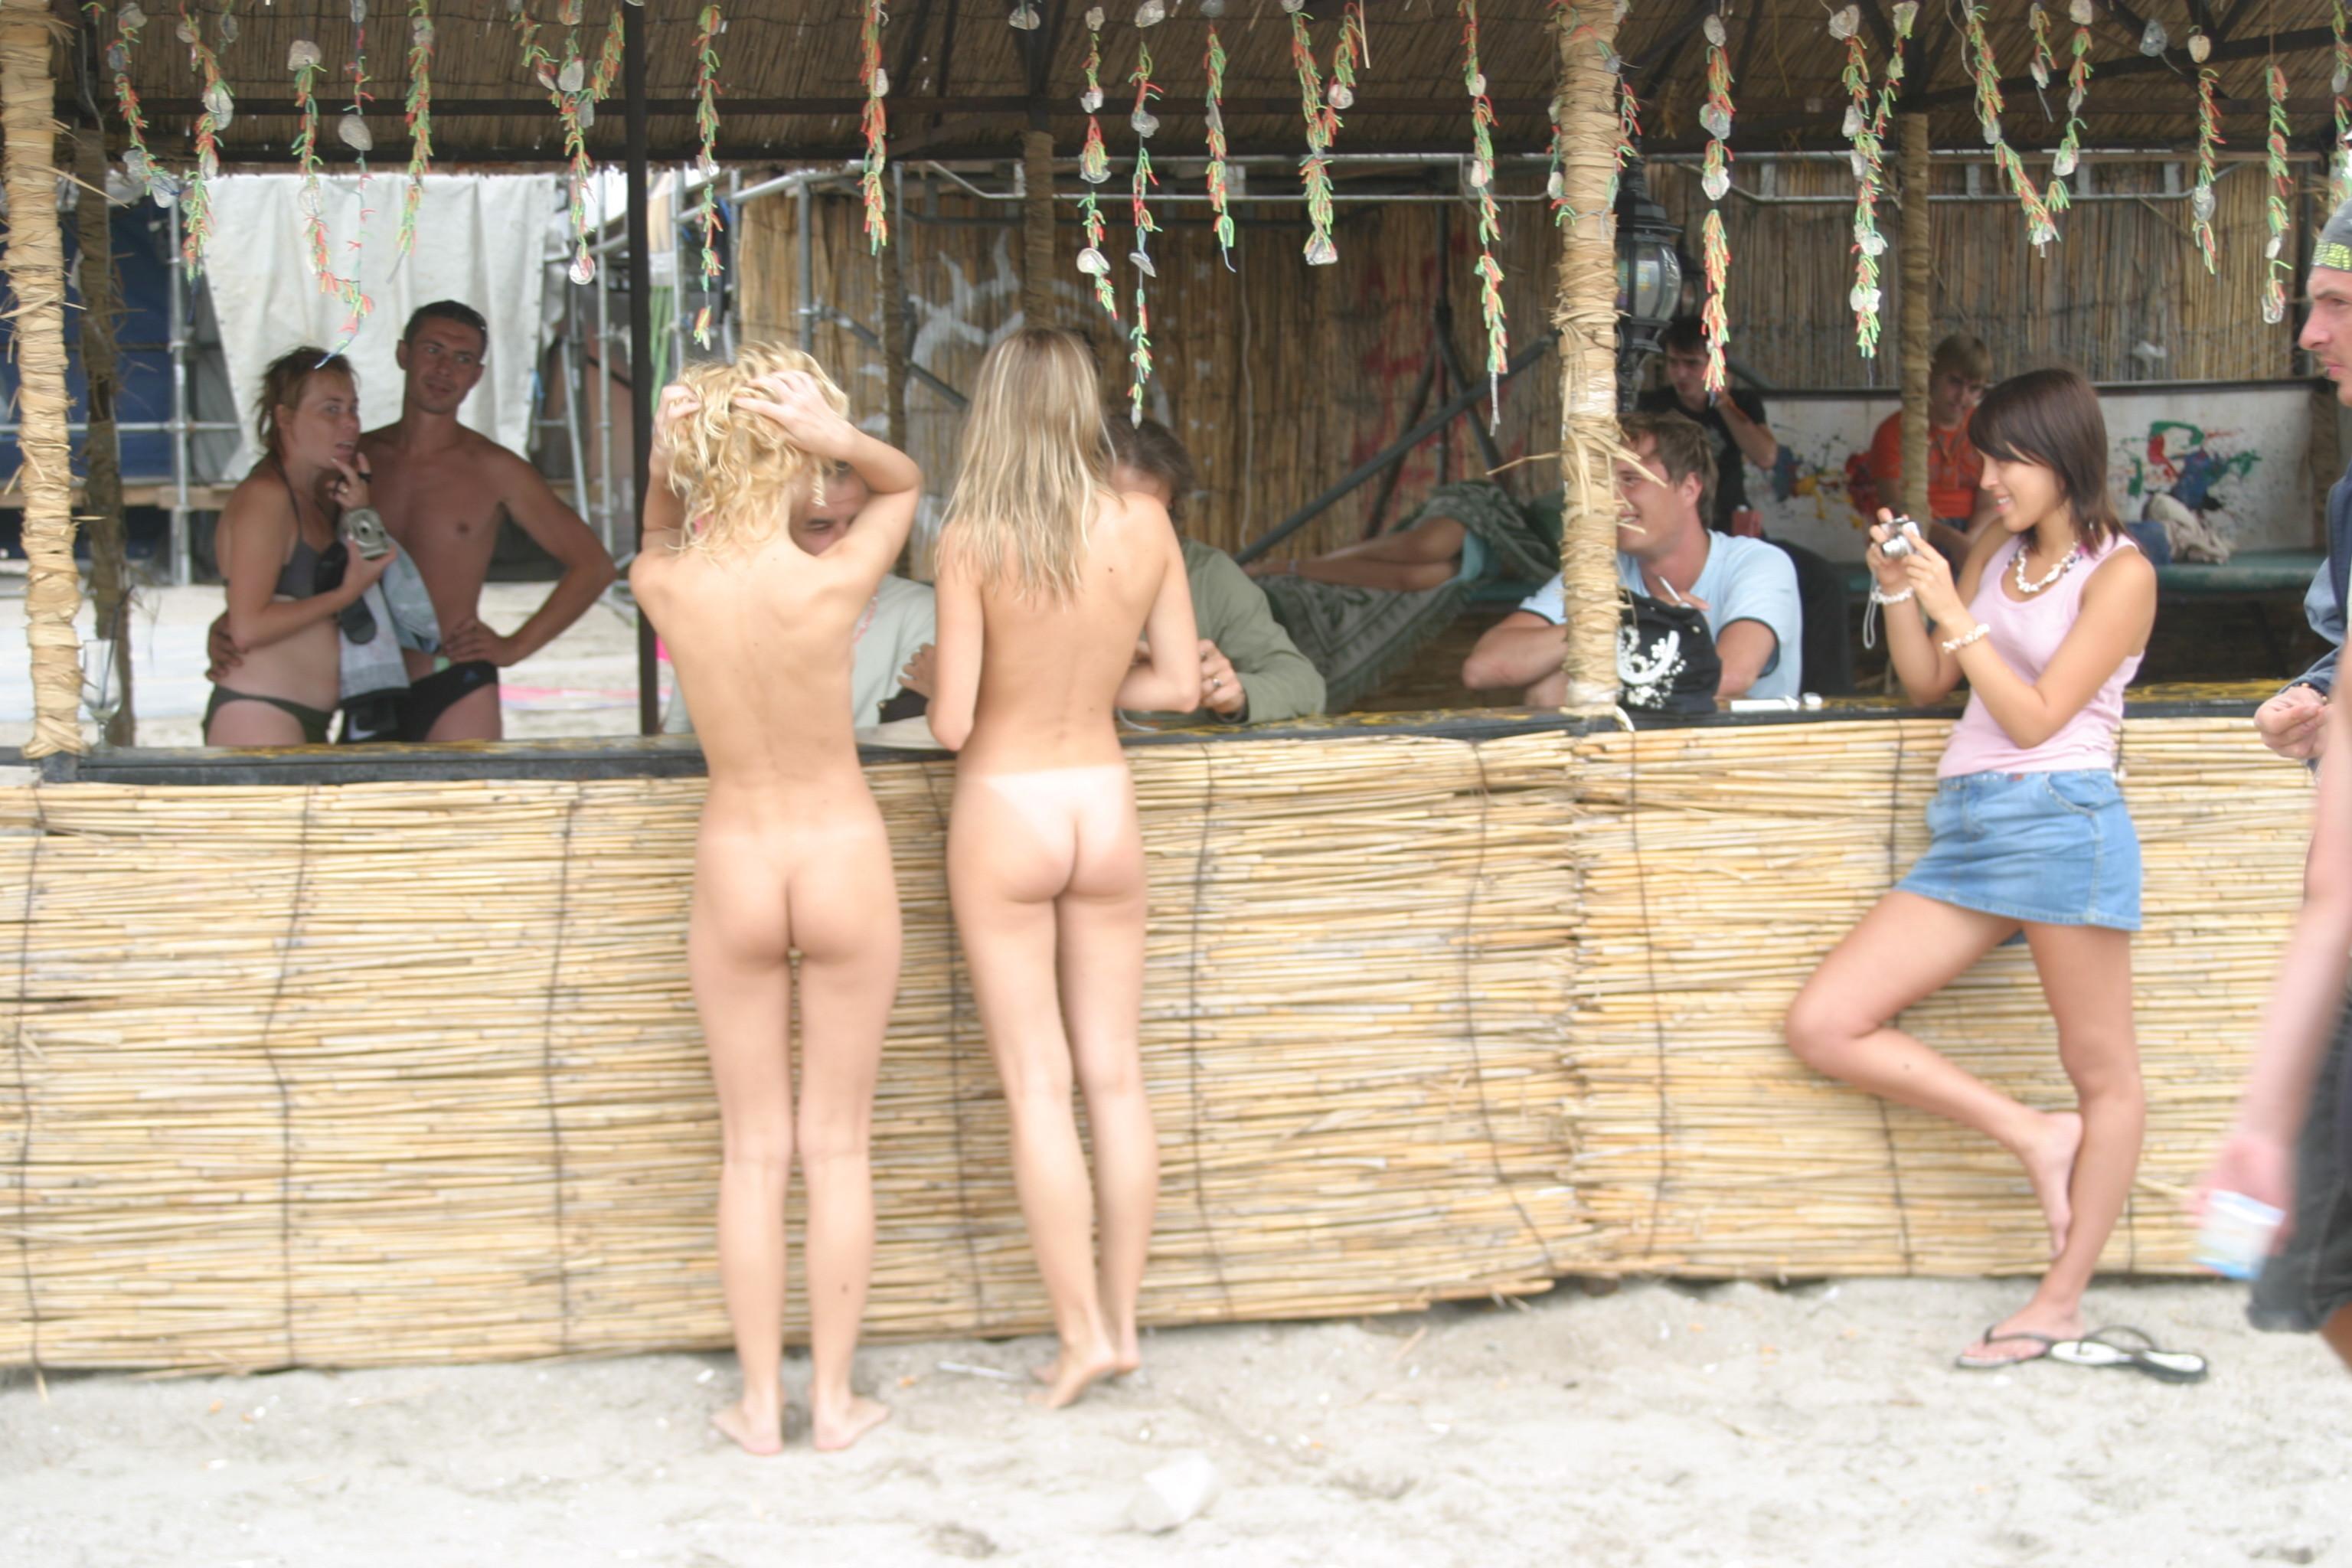 vika-y-lena-l-beach-nude-in-public-metart-35